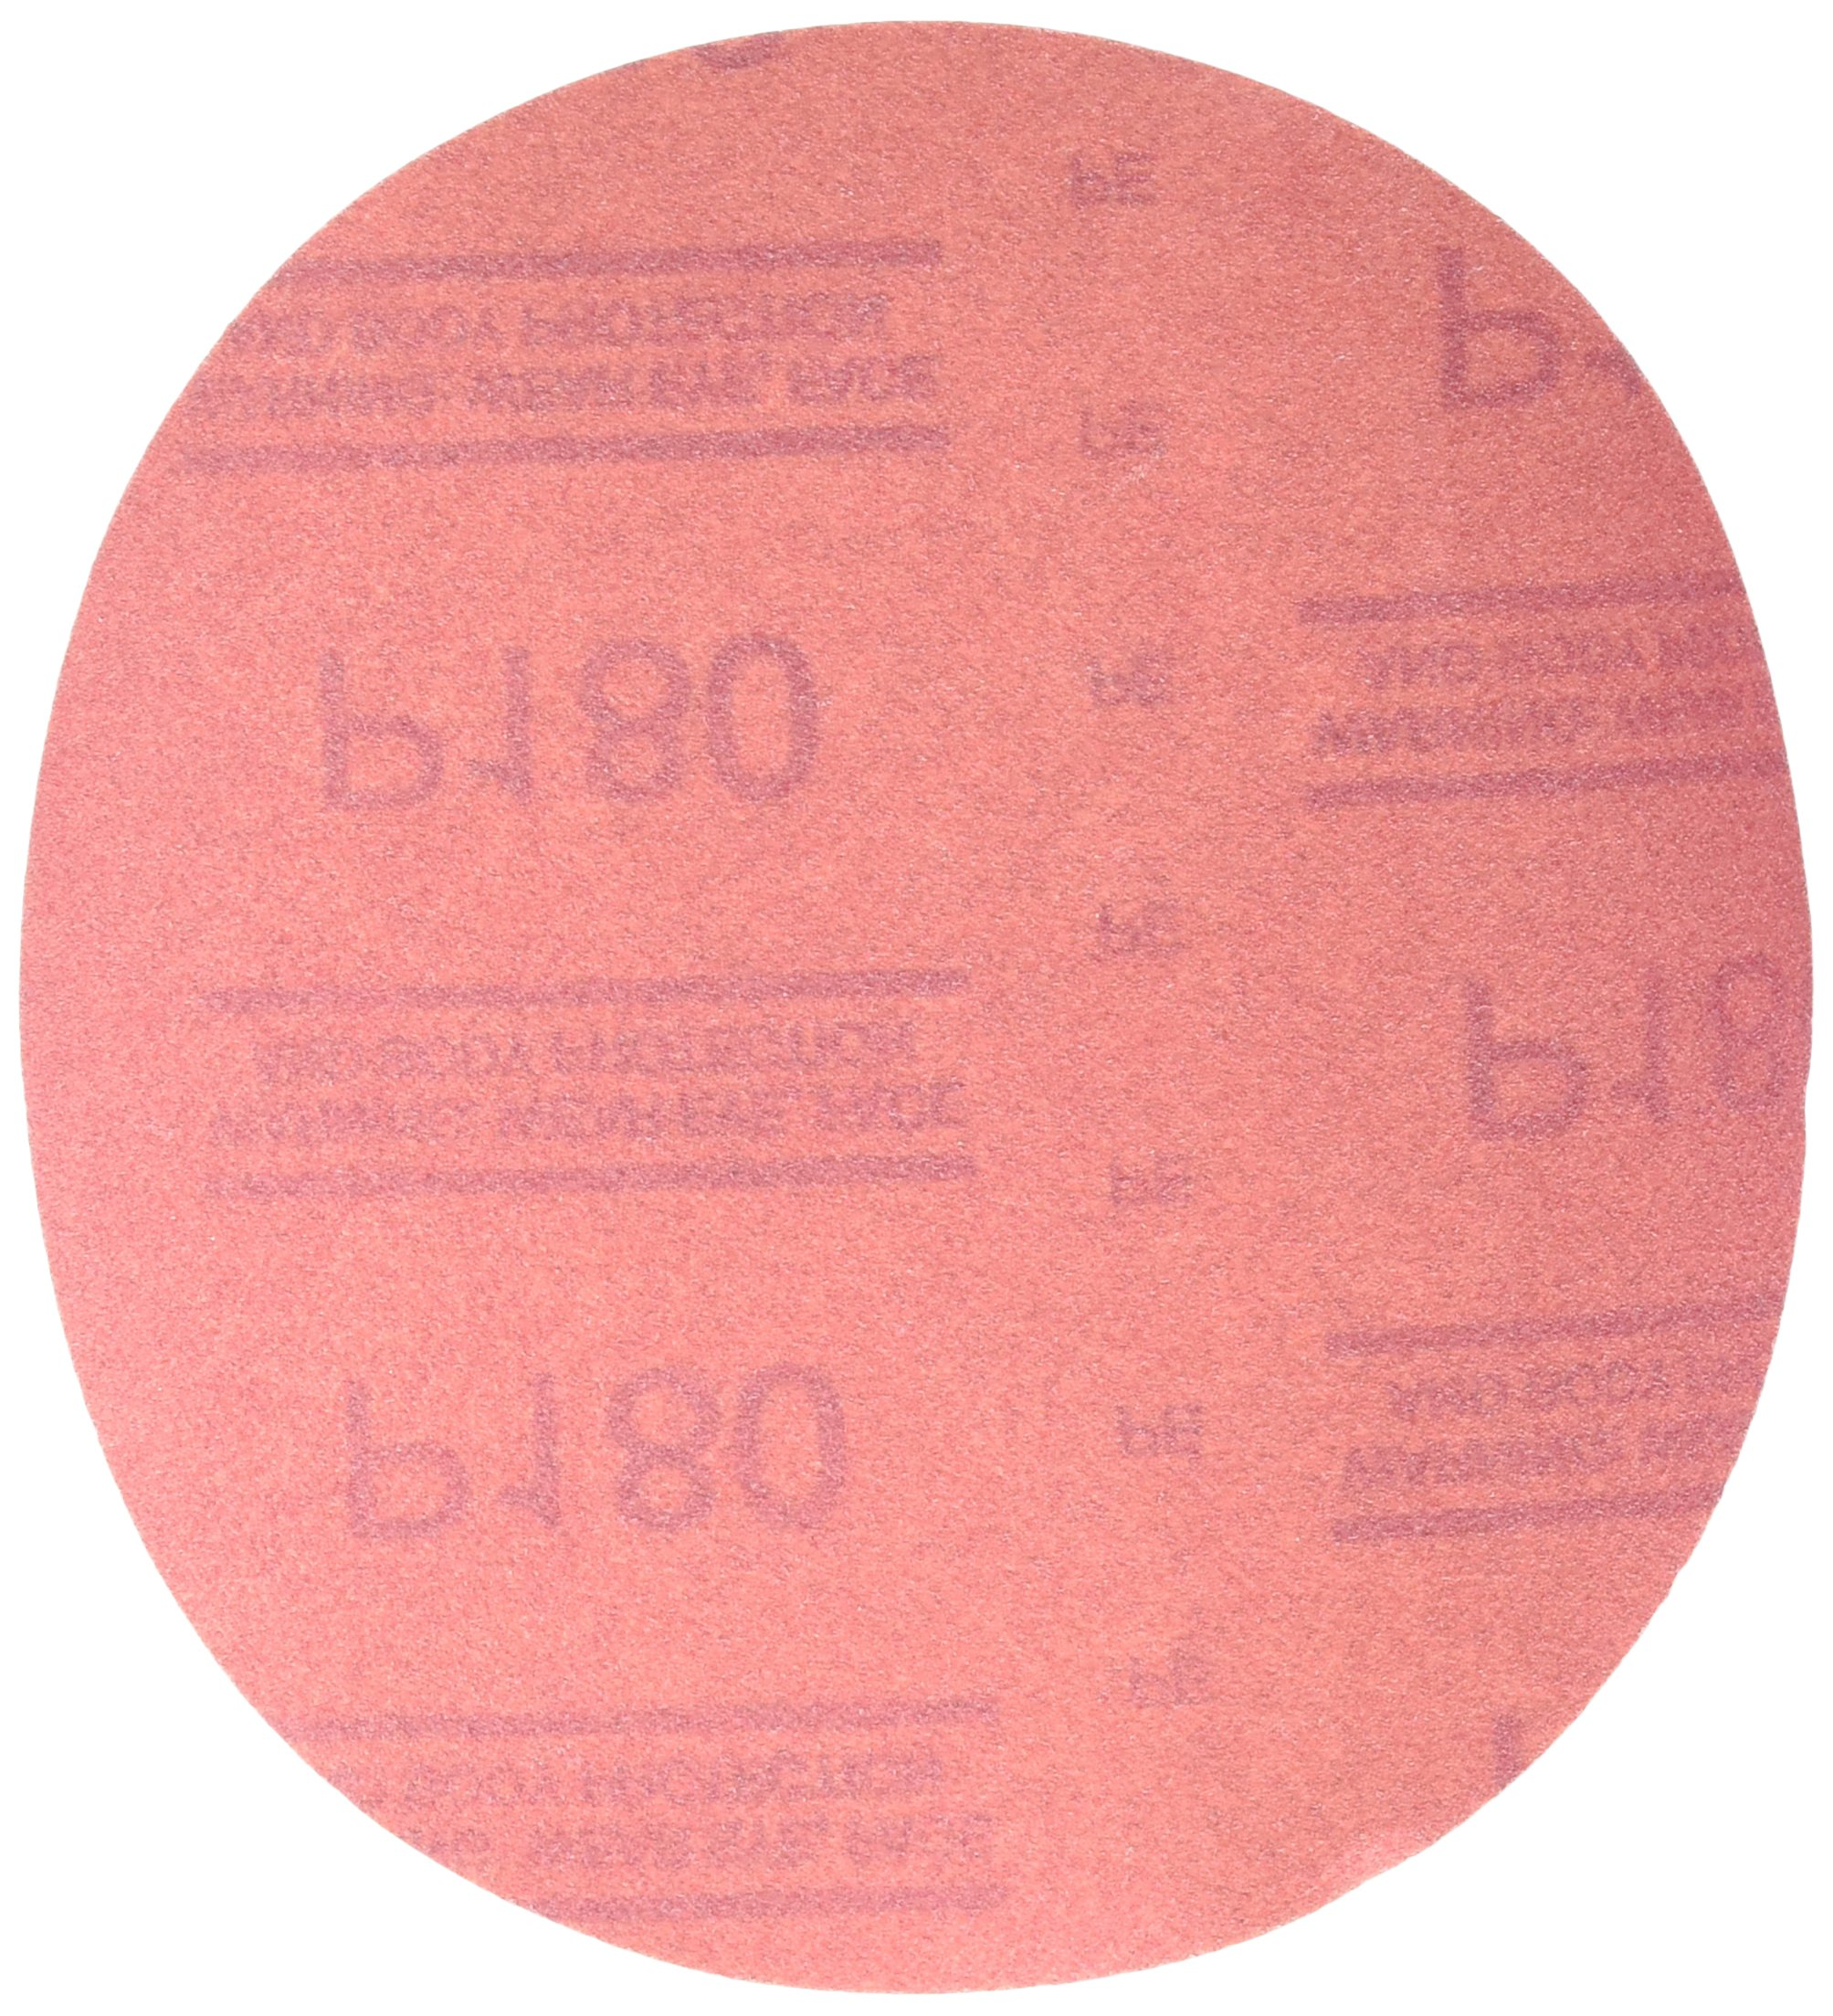 3M 01222 Hookit Red 6'' P180 Grit Abrasive Disc